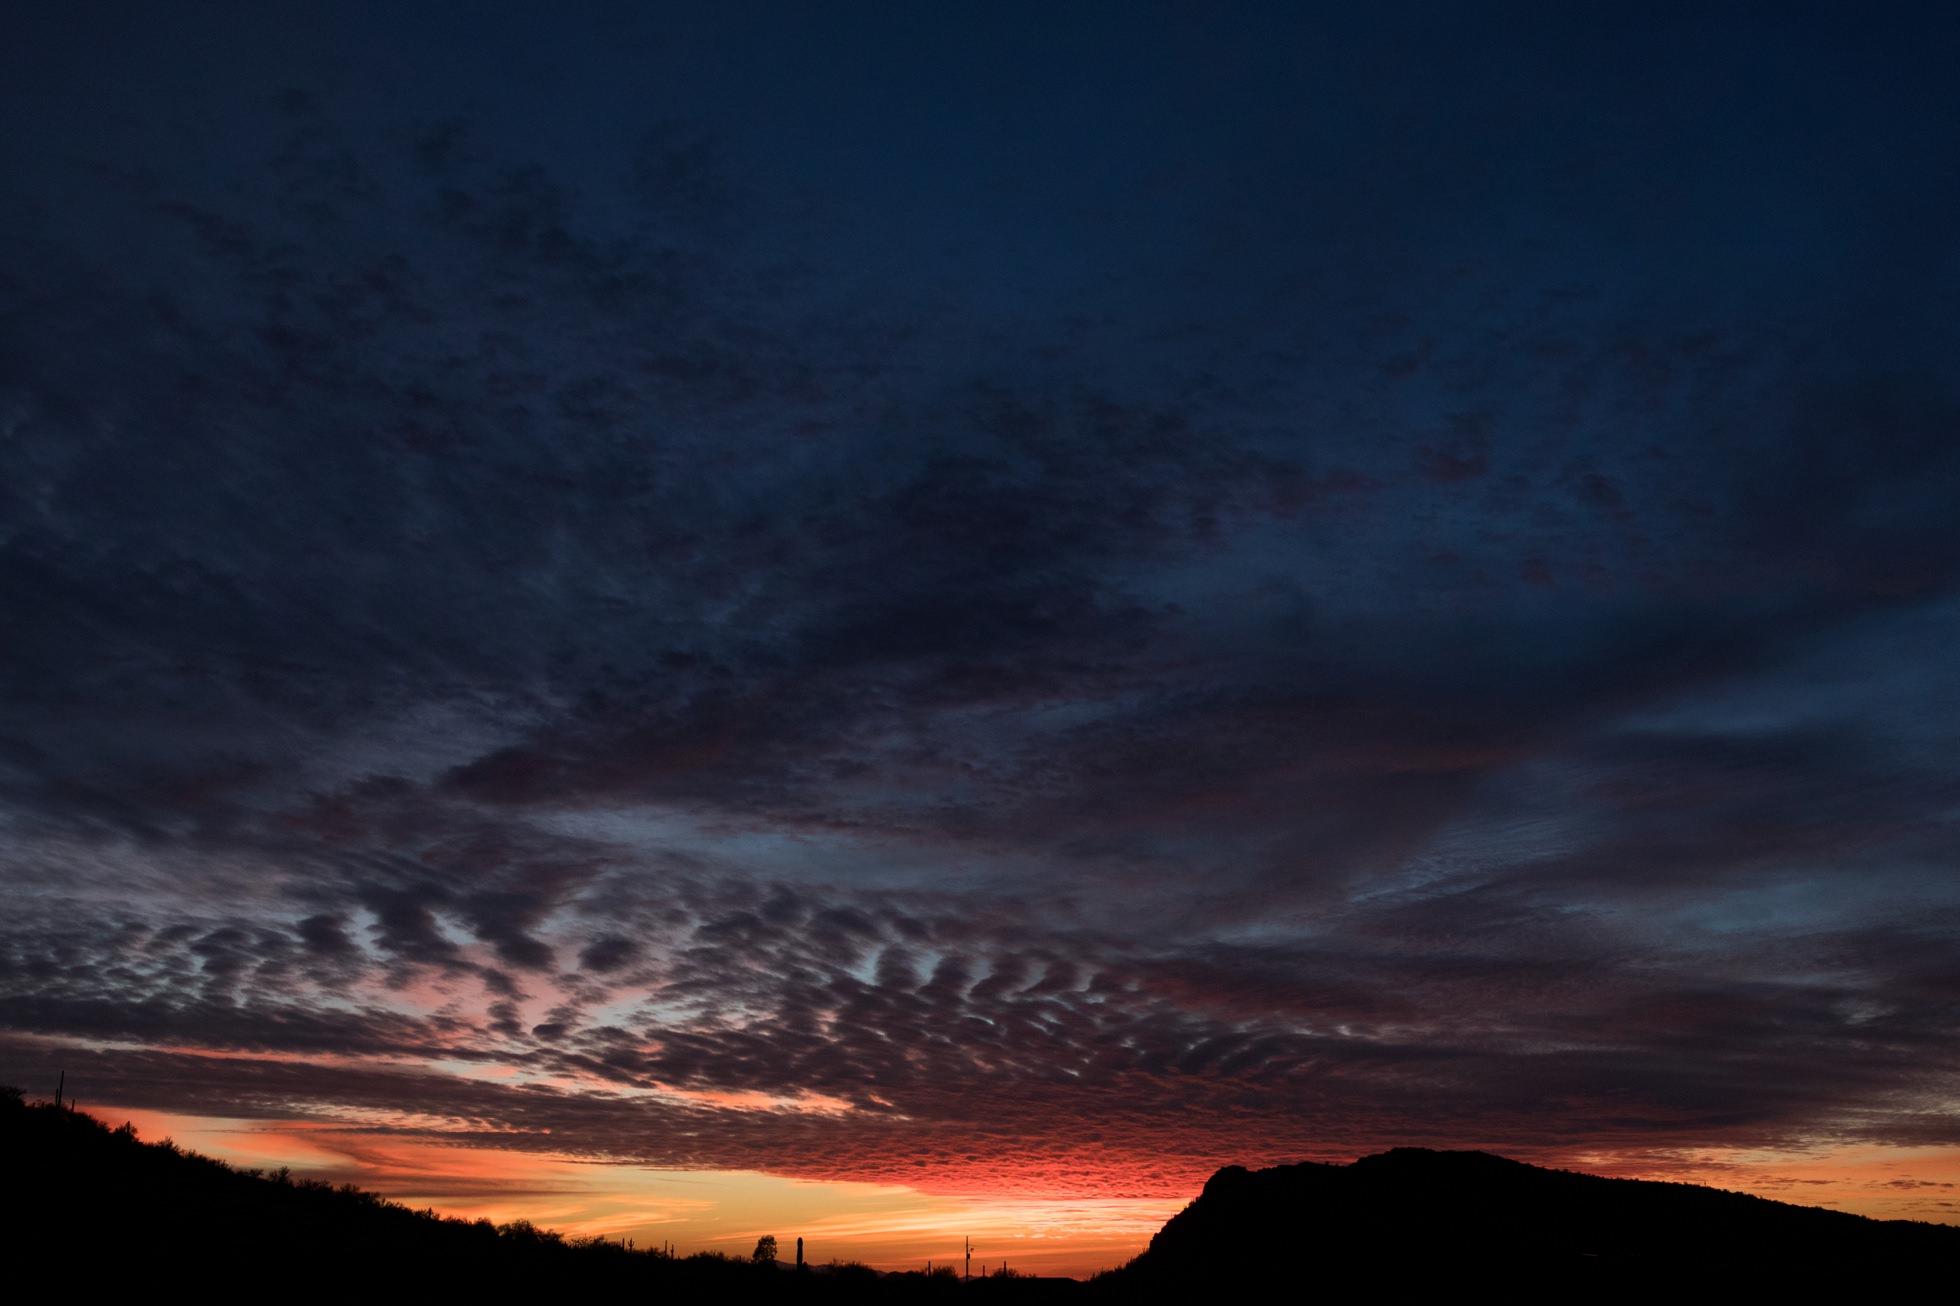 0160-phoenix-arizona-sunset-camelback-mountain-new-river